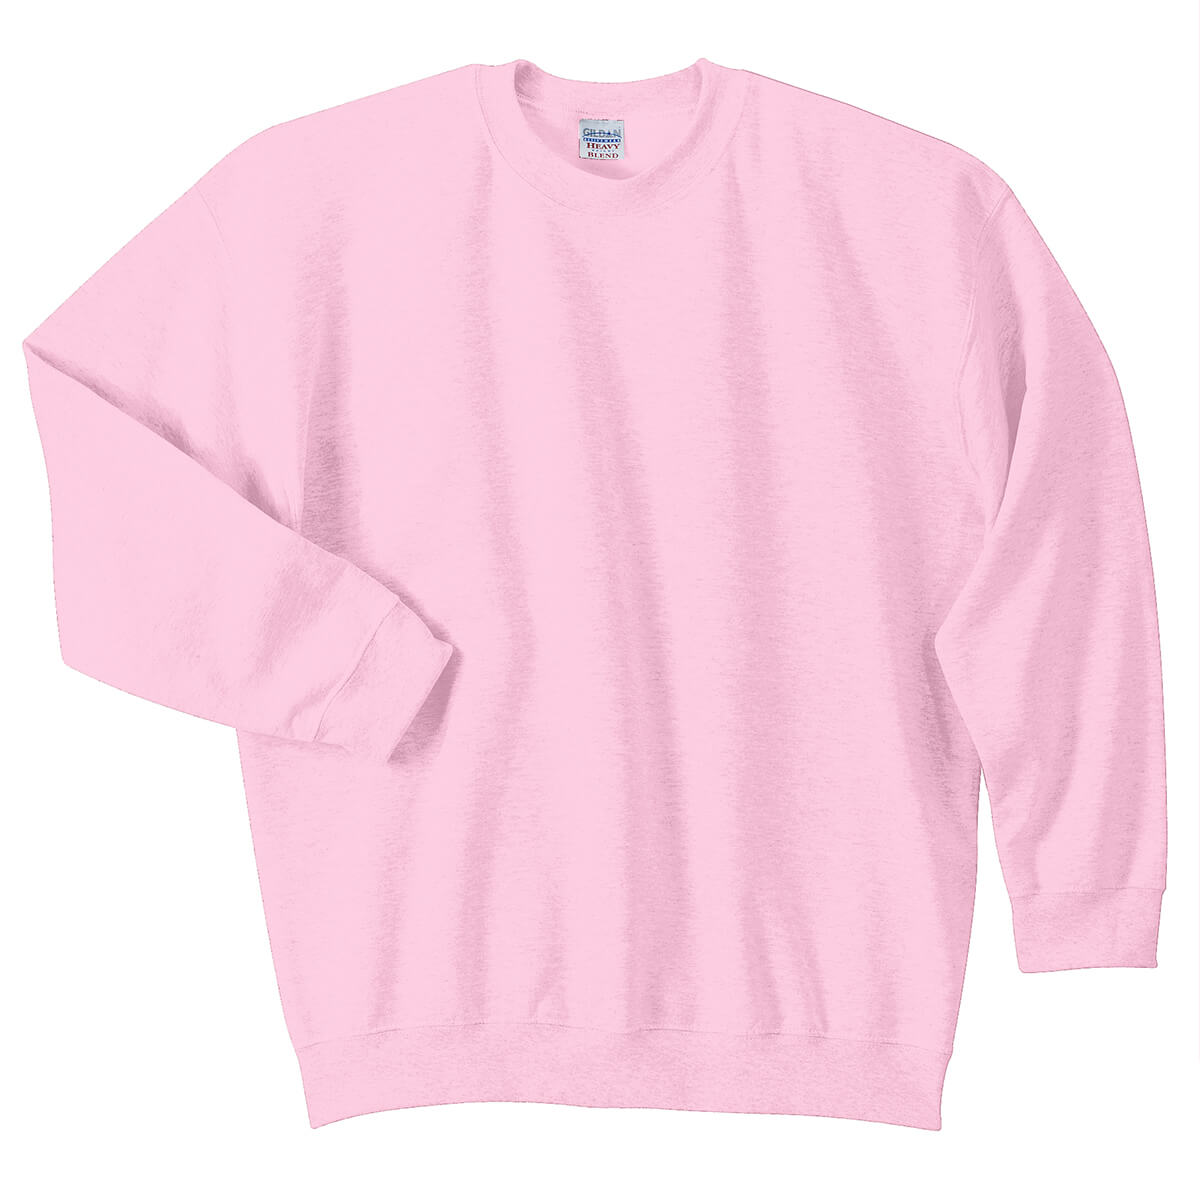 18000-light-pink-5